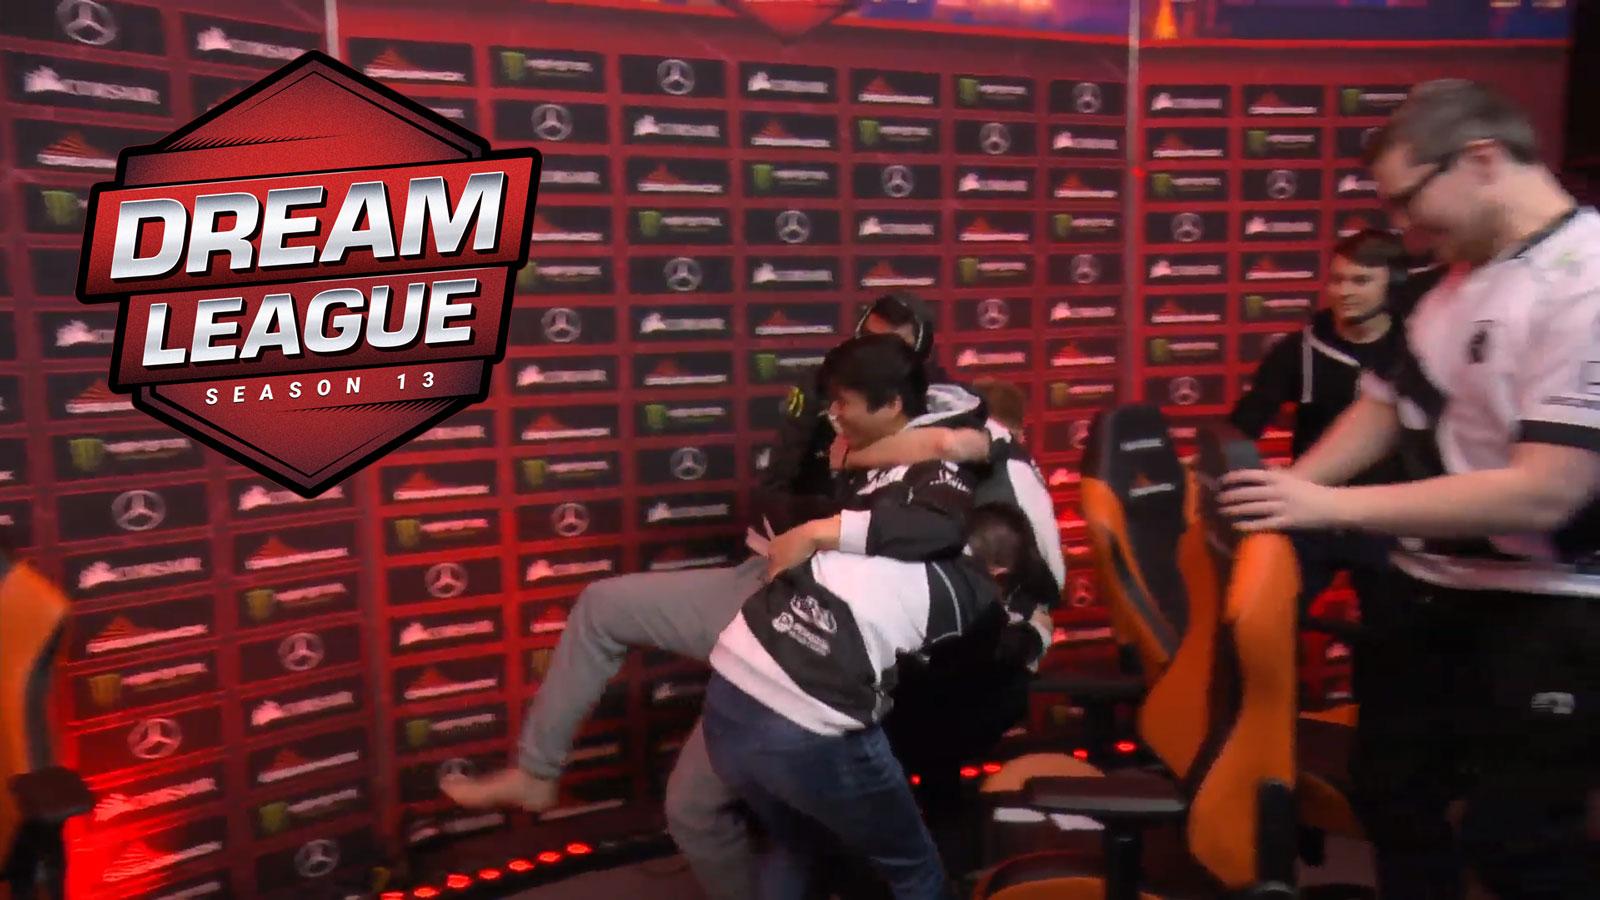 Team Liquid at DreamLeague Season 13 Dota 2 major